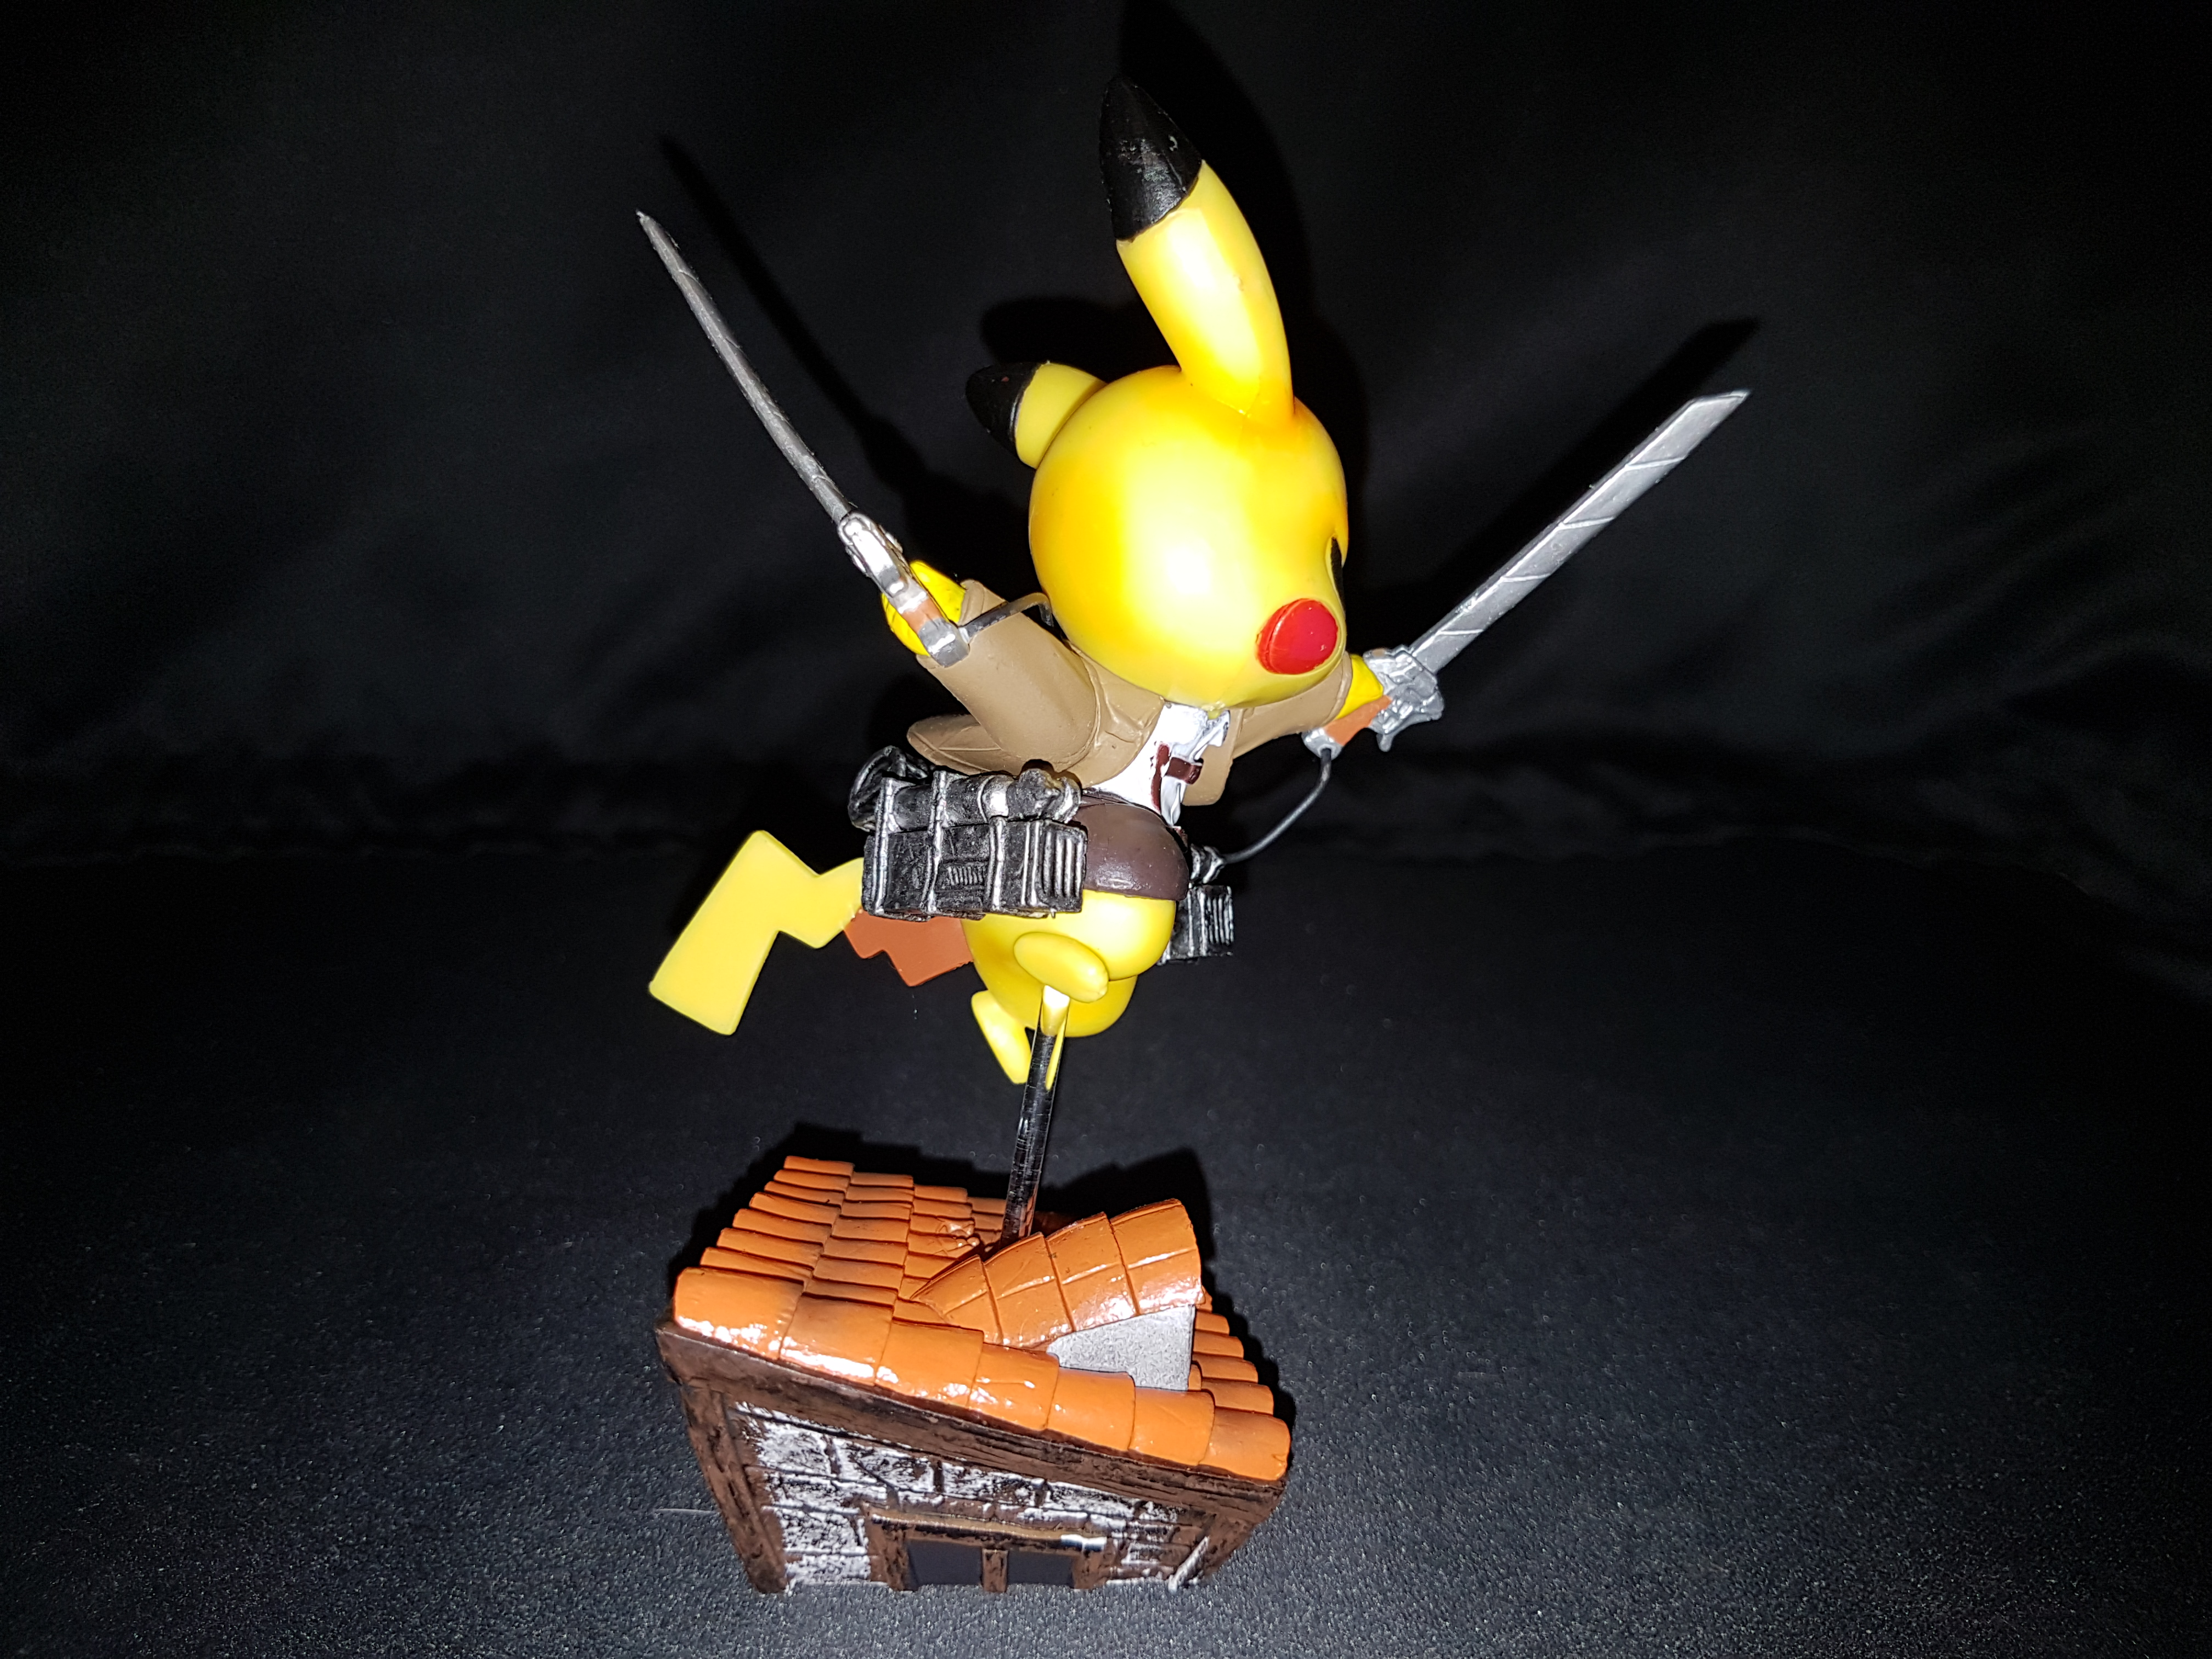 Figurine pikachu attack on titans 5